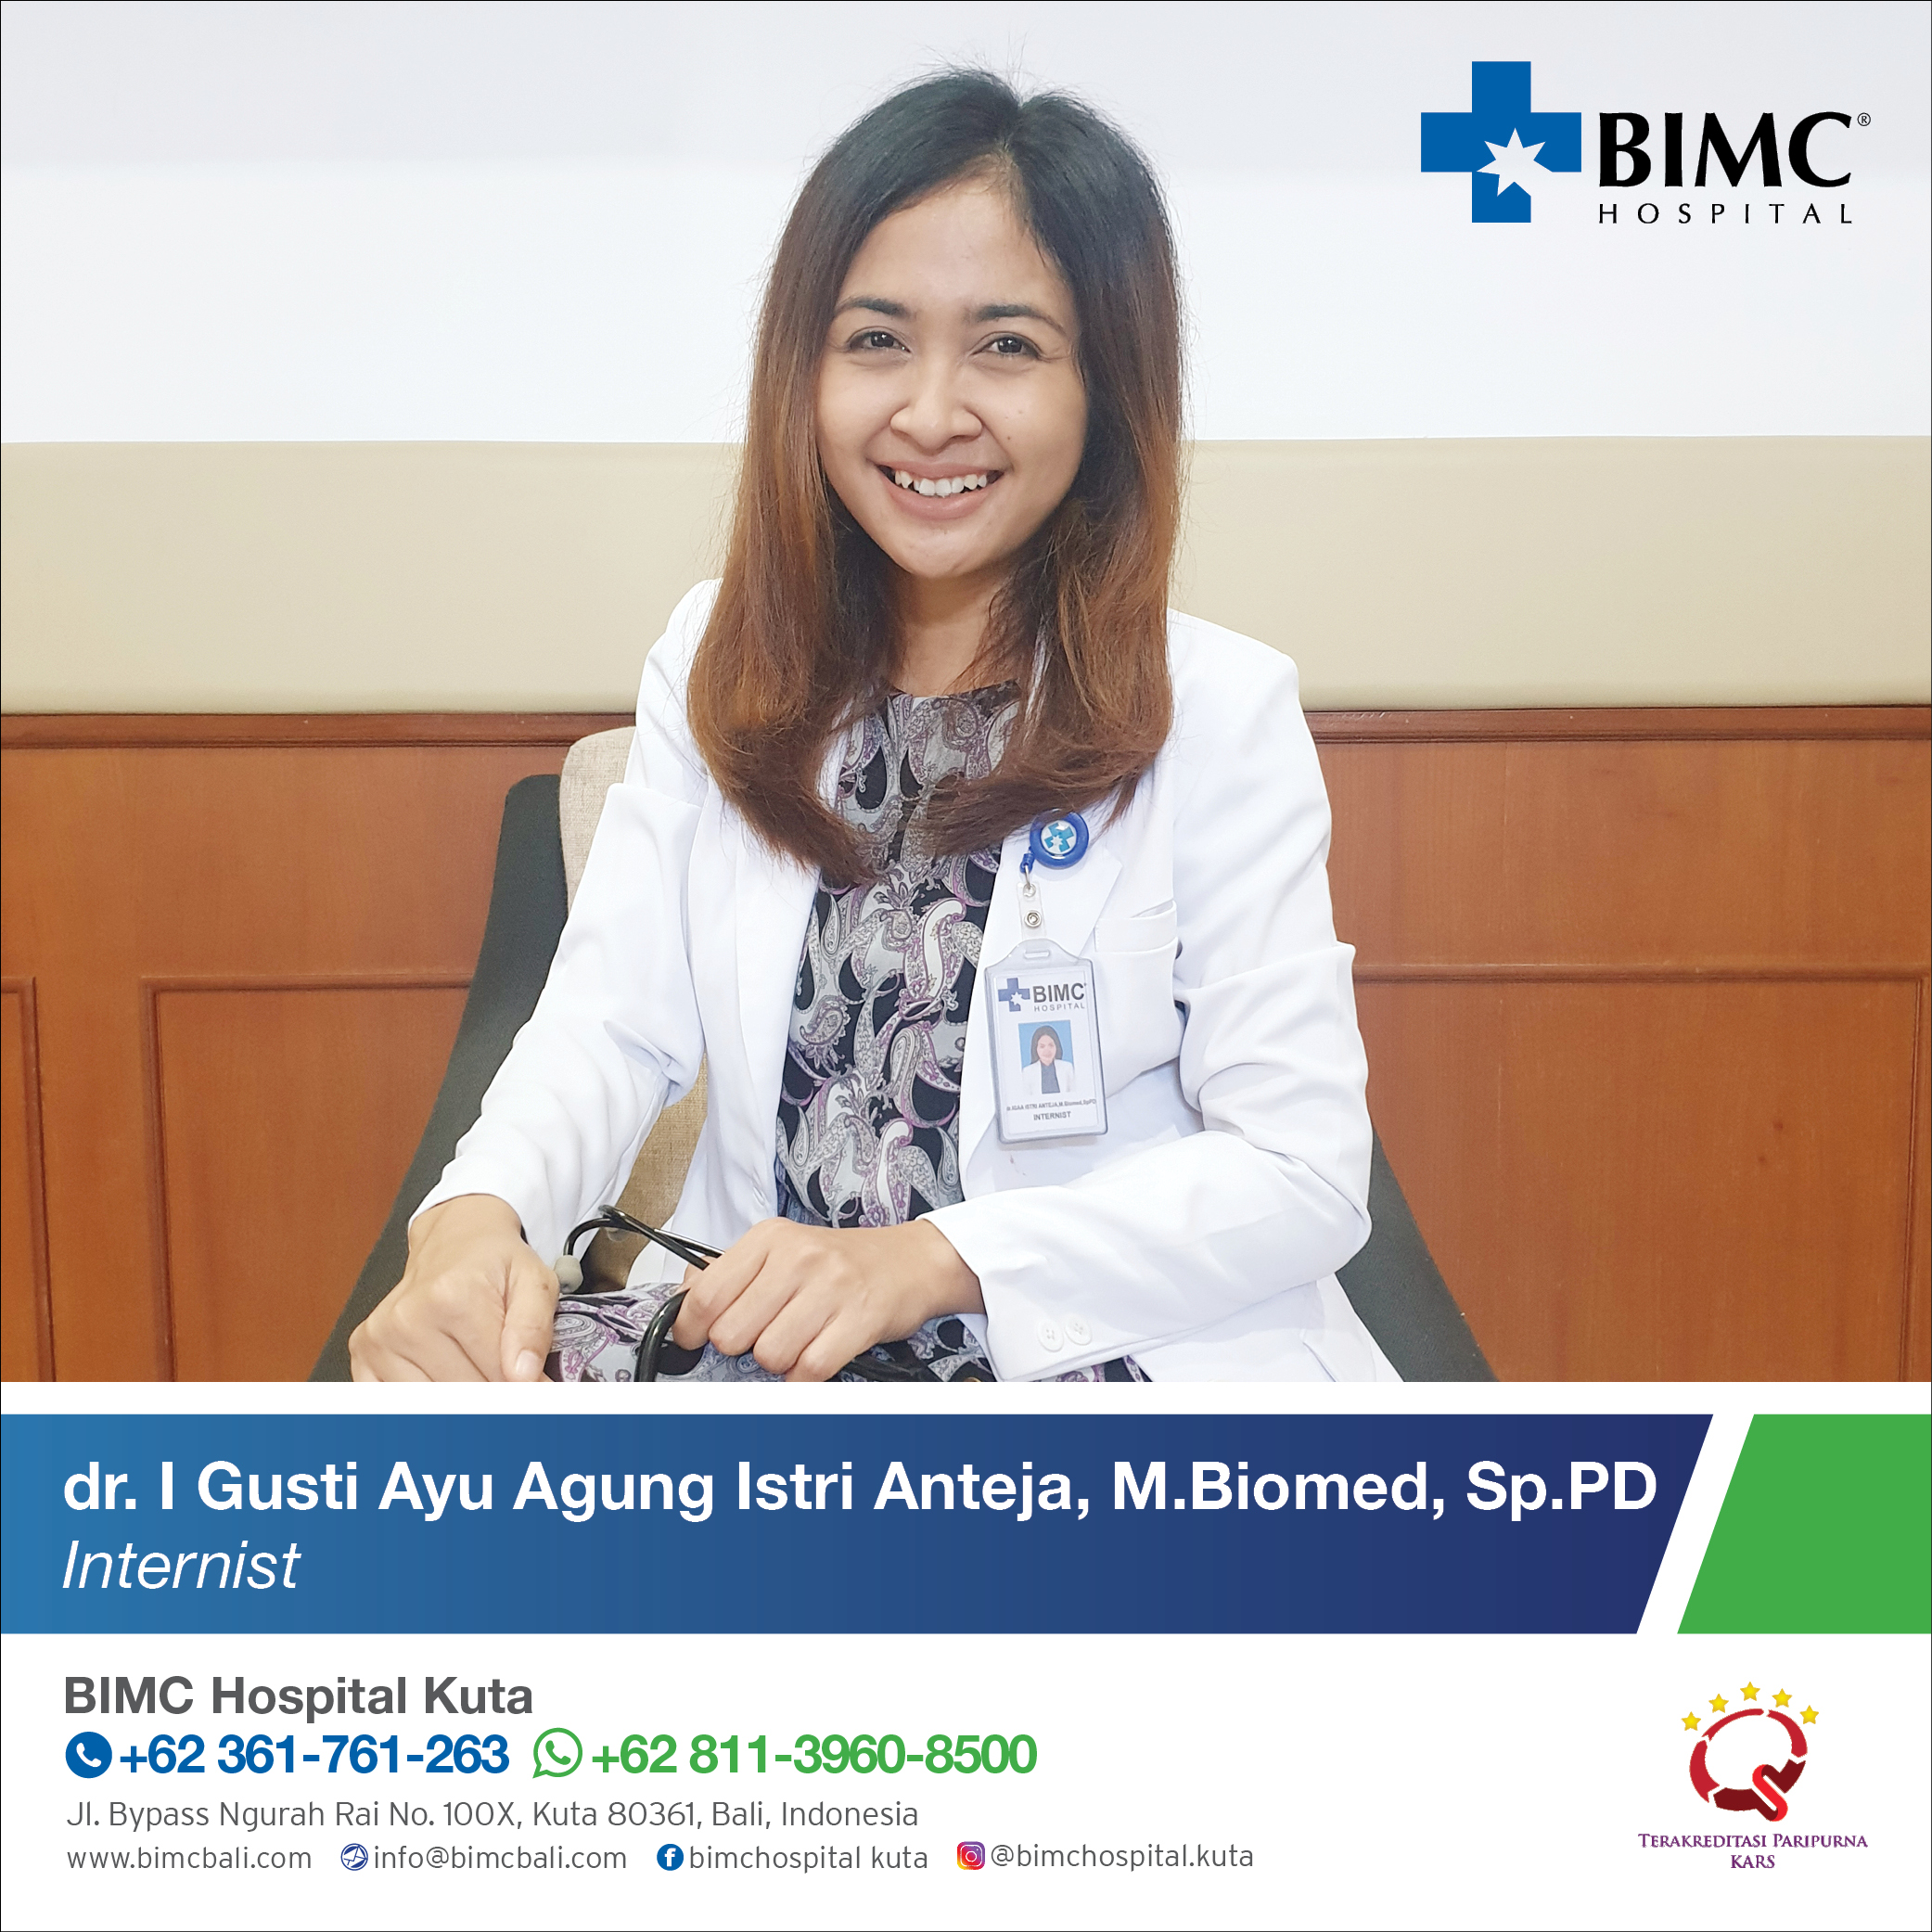 Dr. Anteja